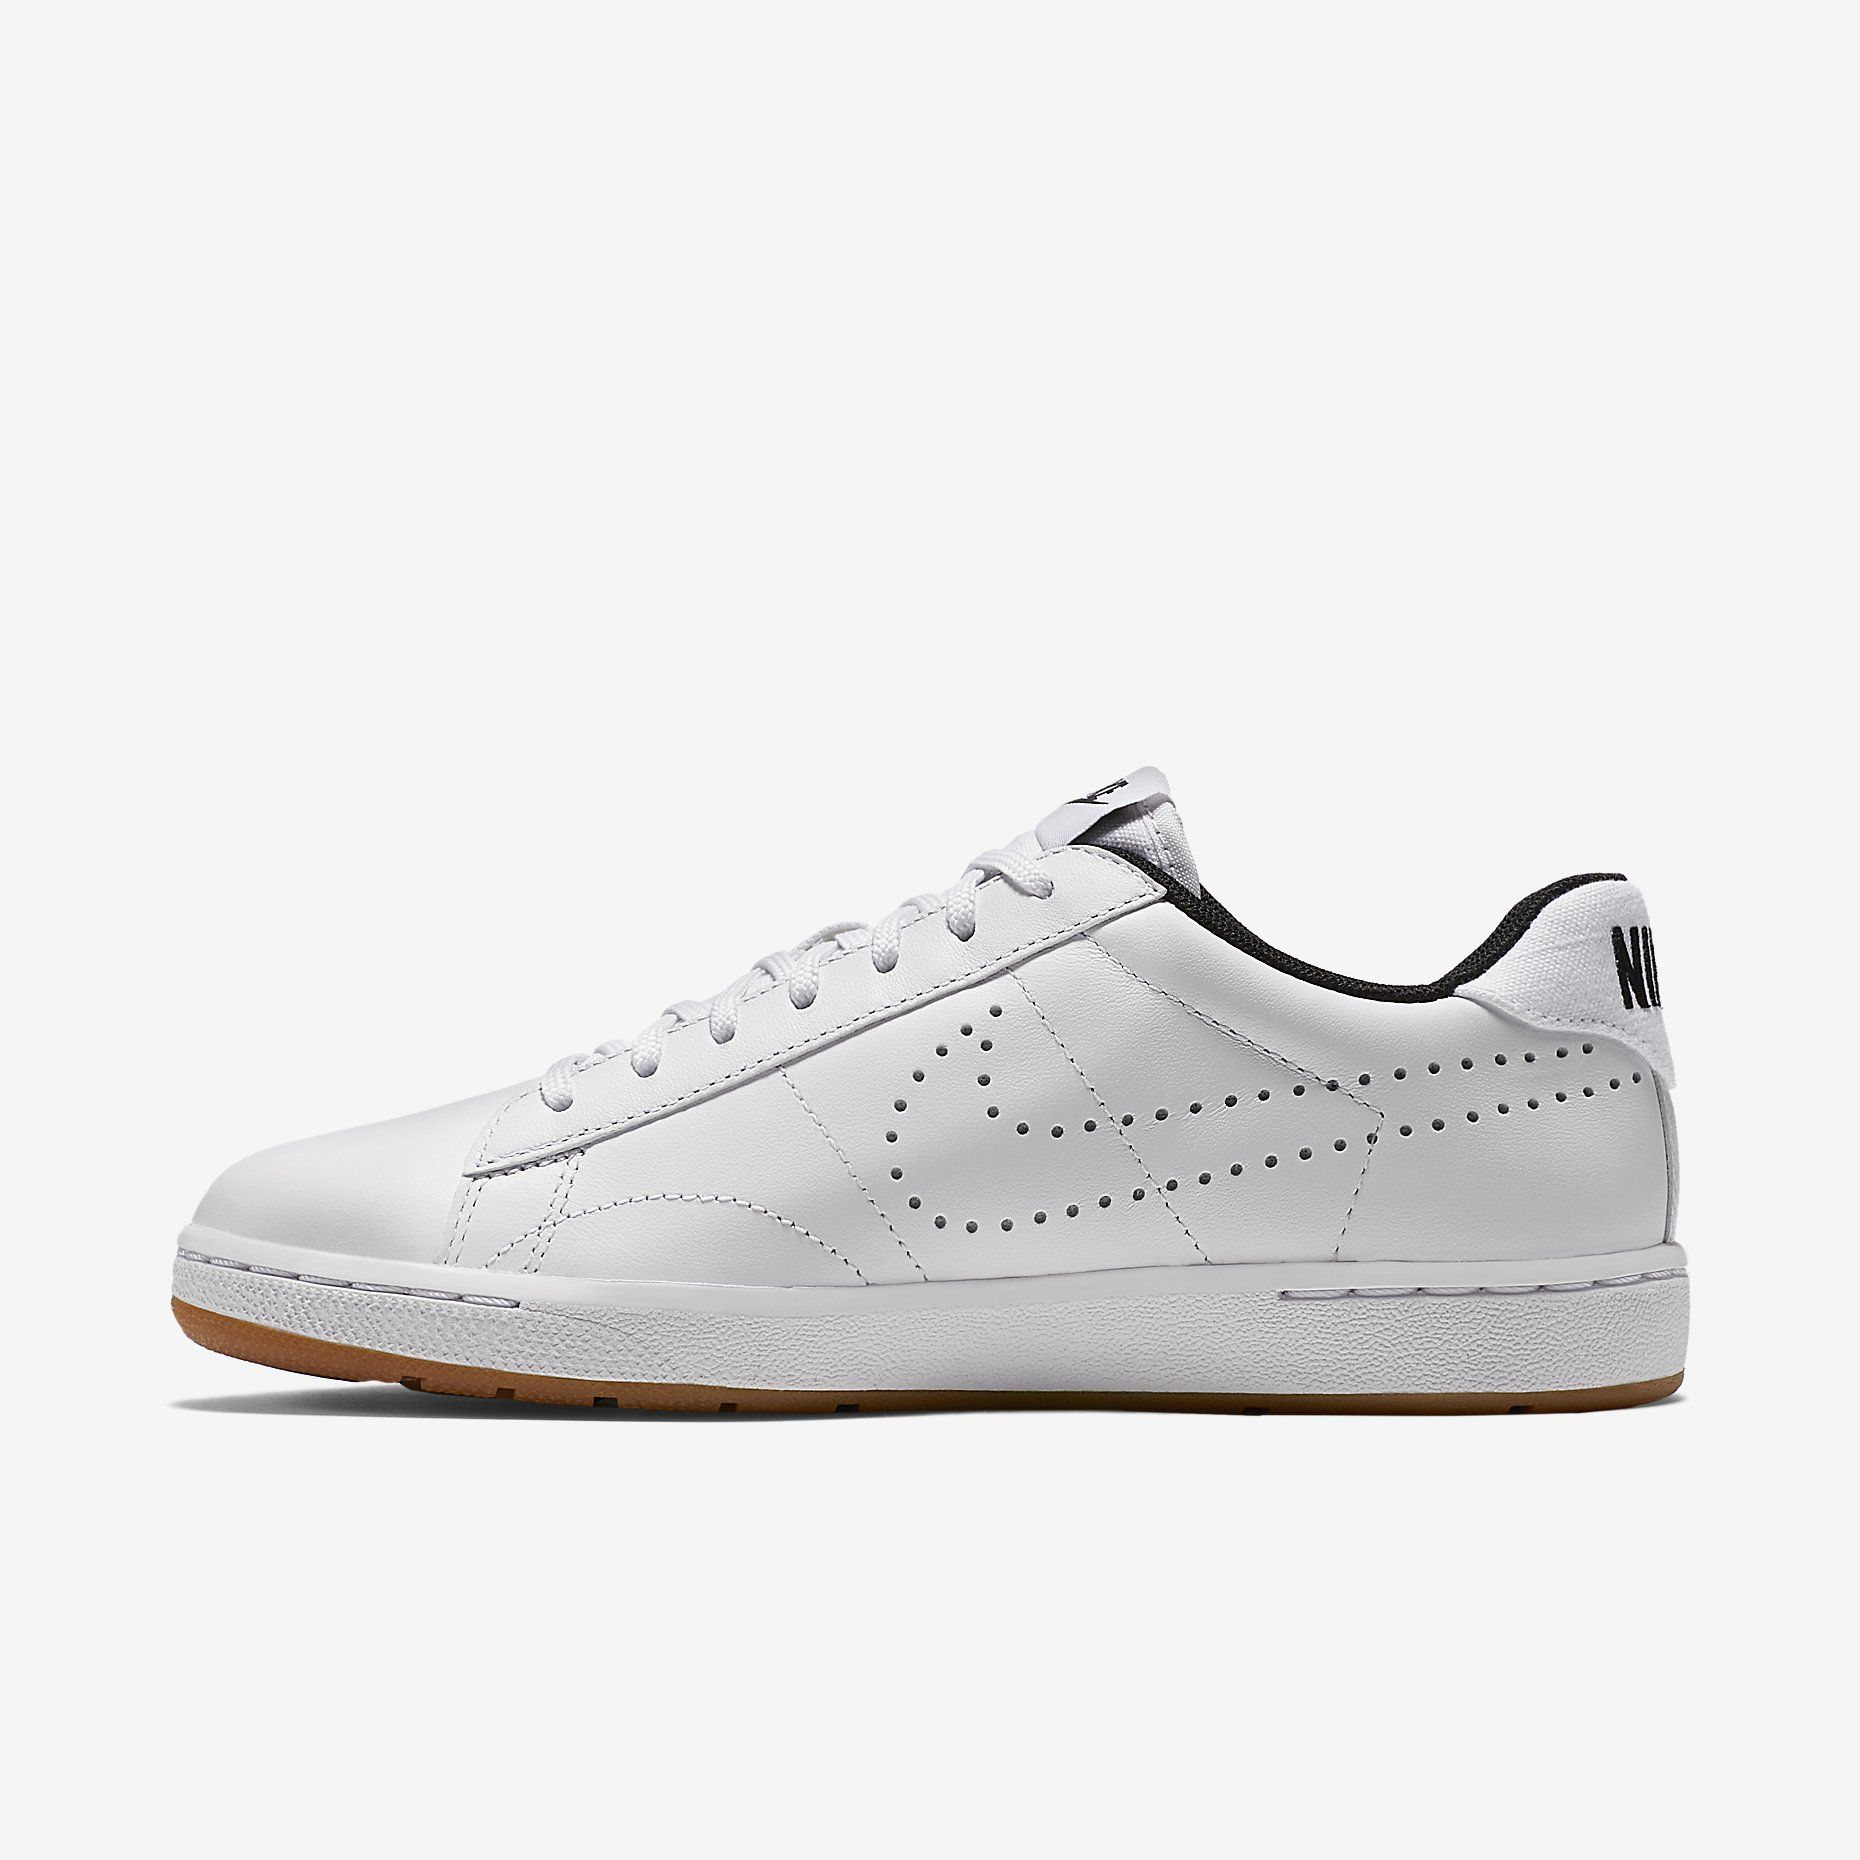 Leather Tennis ShoeStoreWish Ultra Women's Nike Classic LzjqSMVpUG